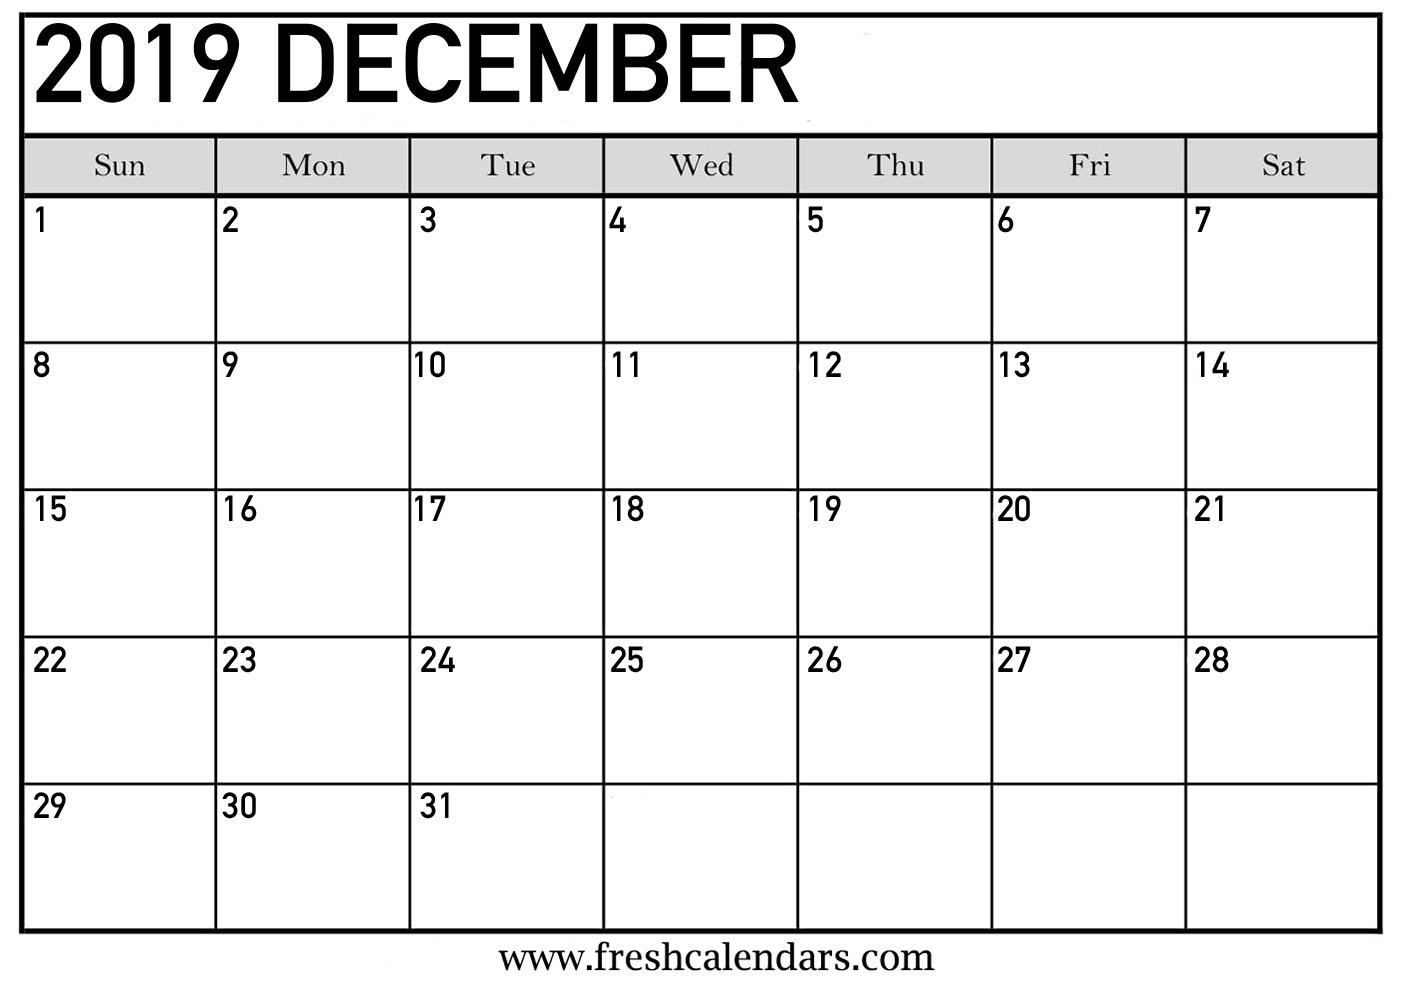 December 2019 Calendar Printable - Fresh Calendars